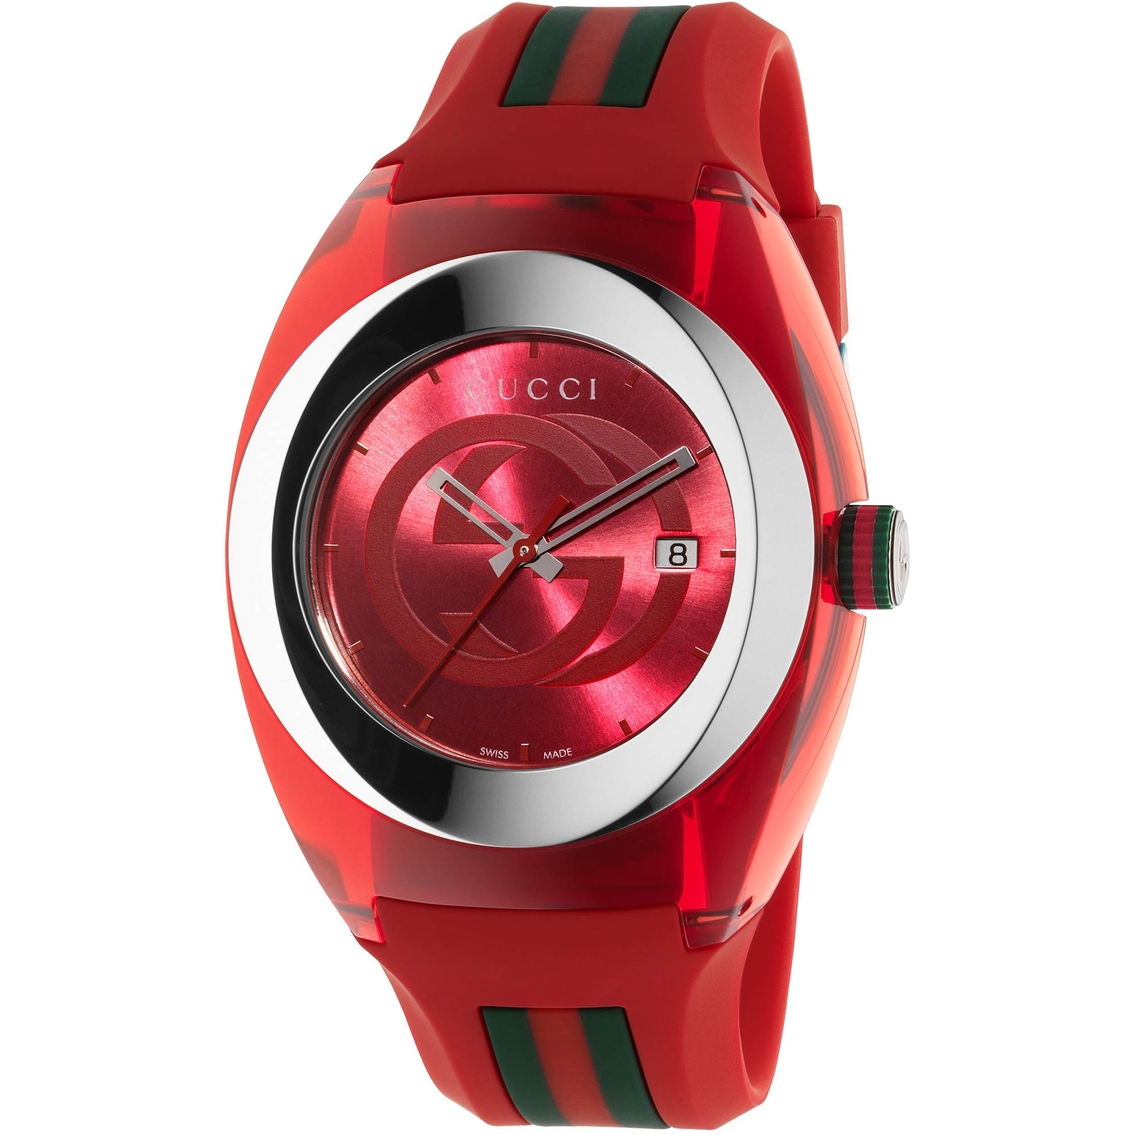 72439c715ce Gucci Men s Women s Sync Swiss Striped Red Rubber Strap Watch YA137103